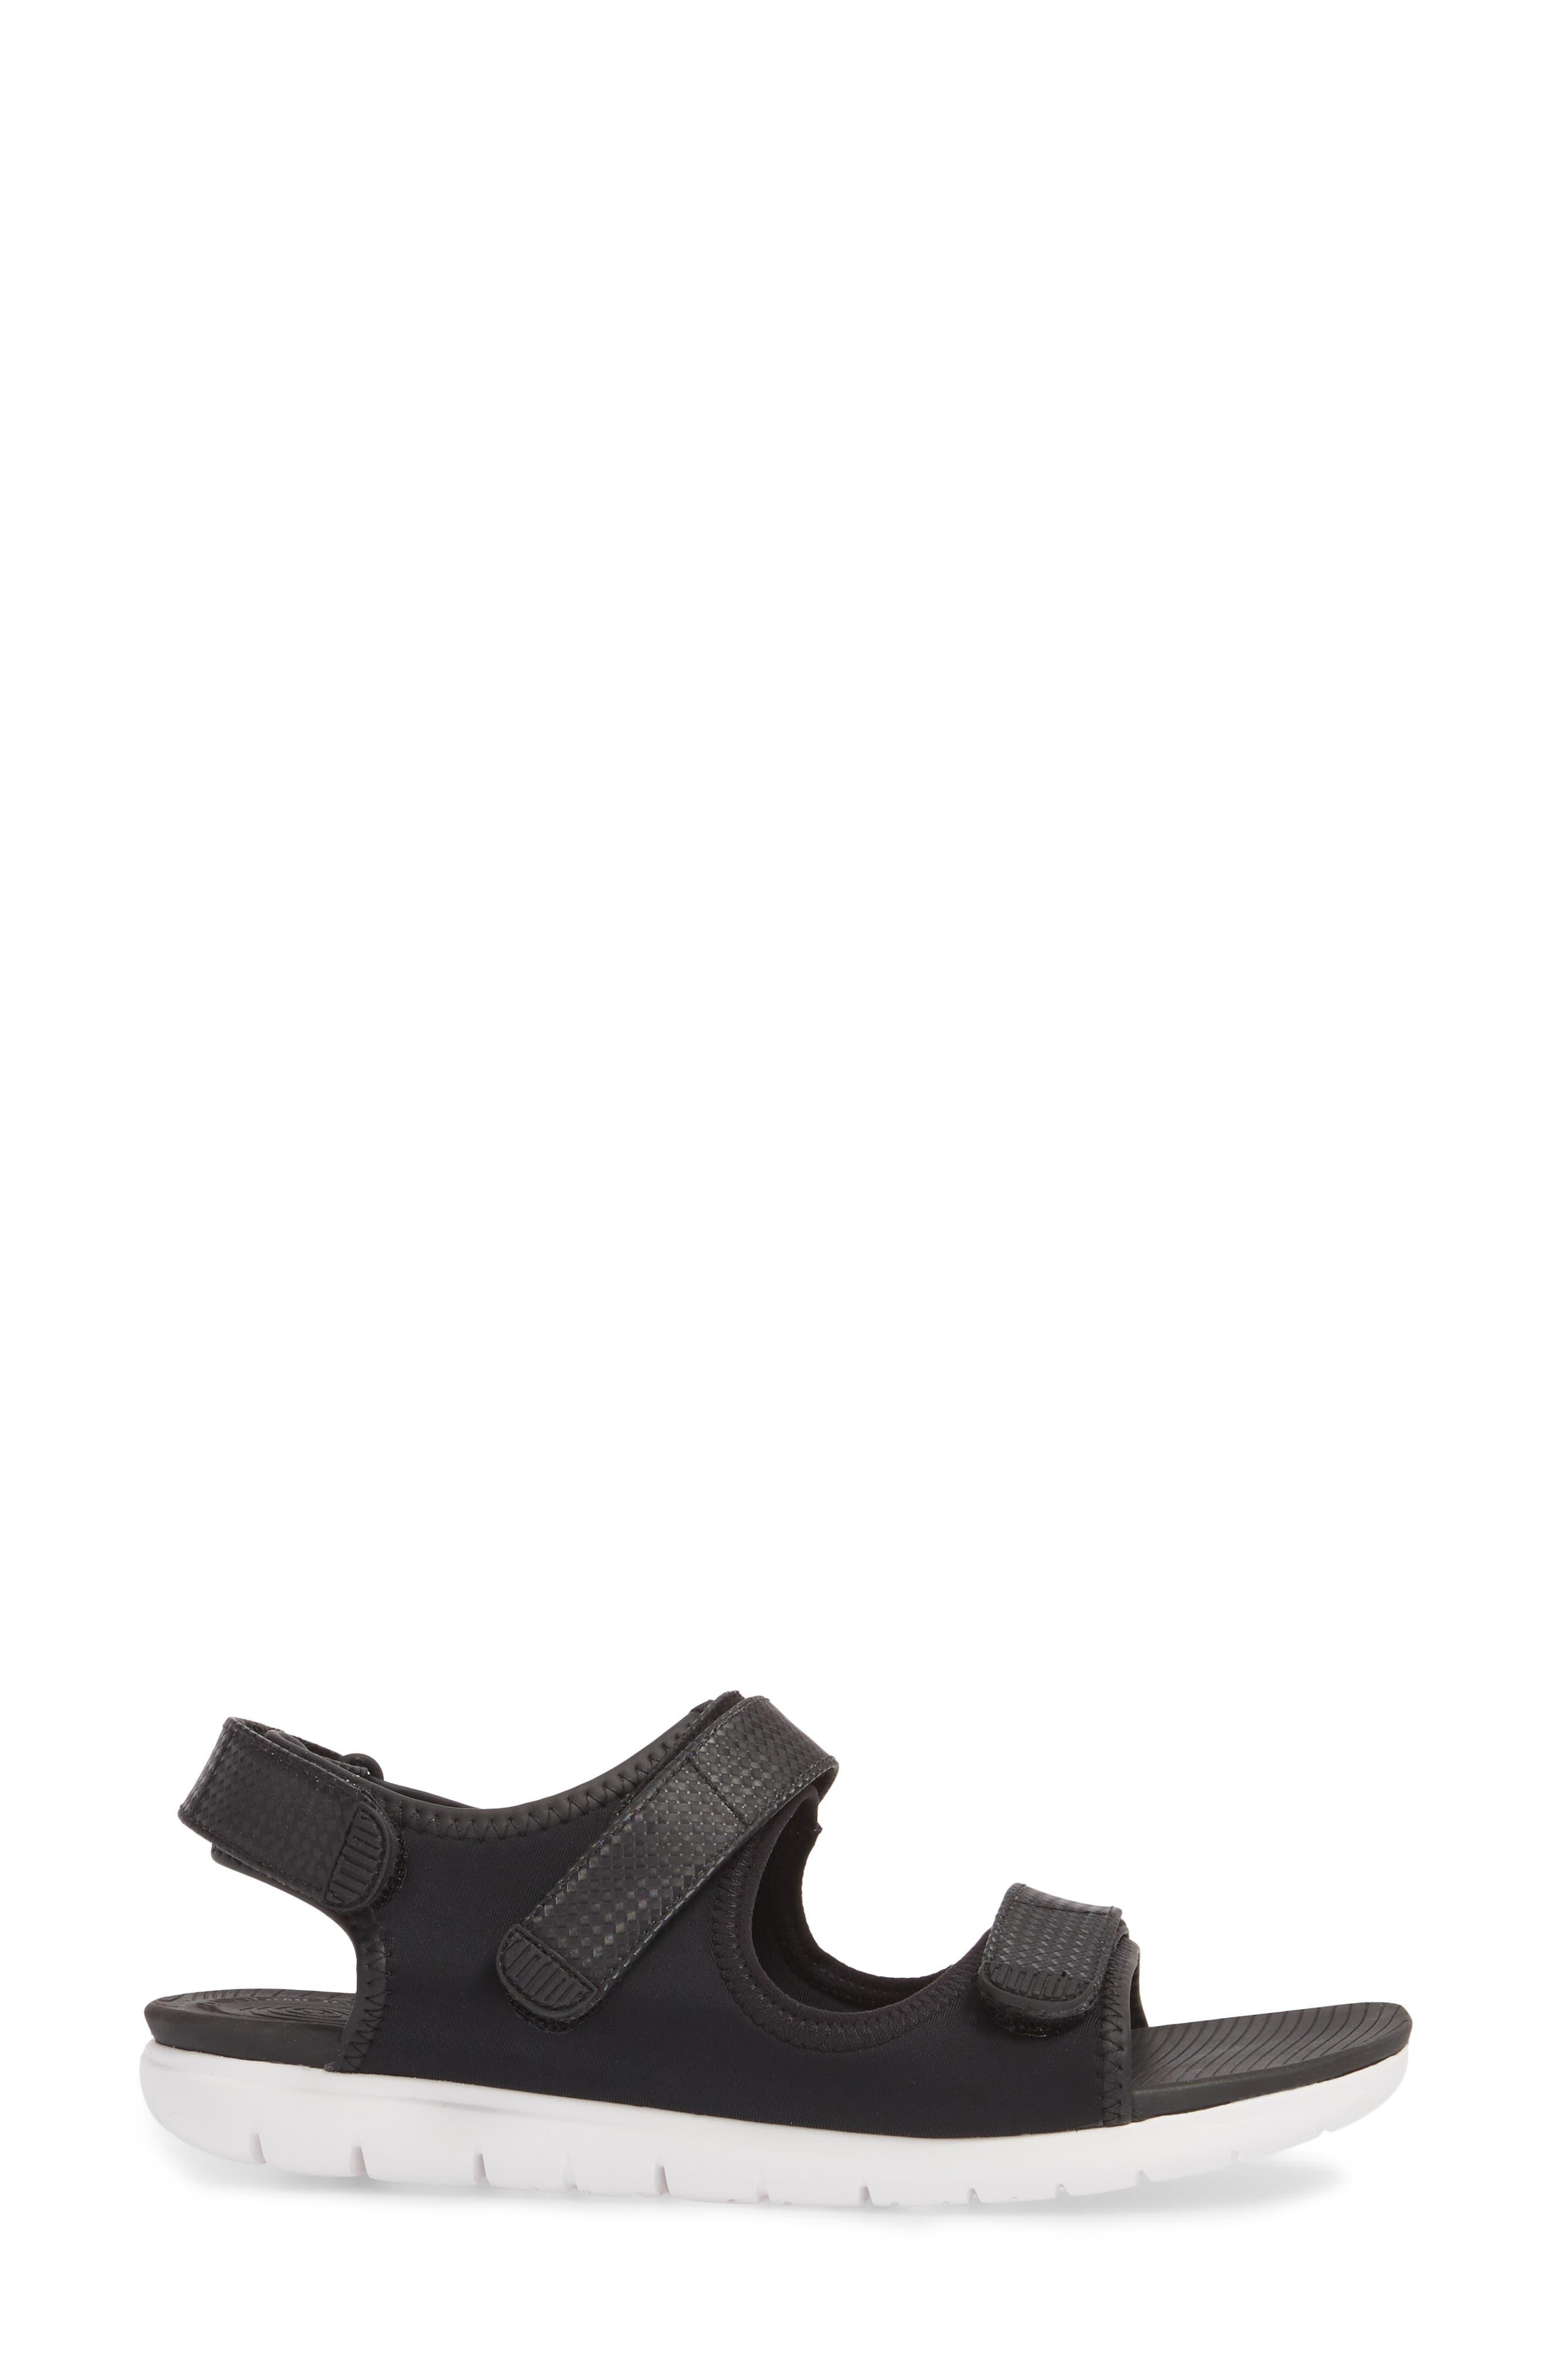 FitfFlop Neoflex<sup>™</sup> Back Strap Sandal,                             Alternate thumbnail 3, color,                             Black Leather